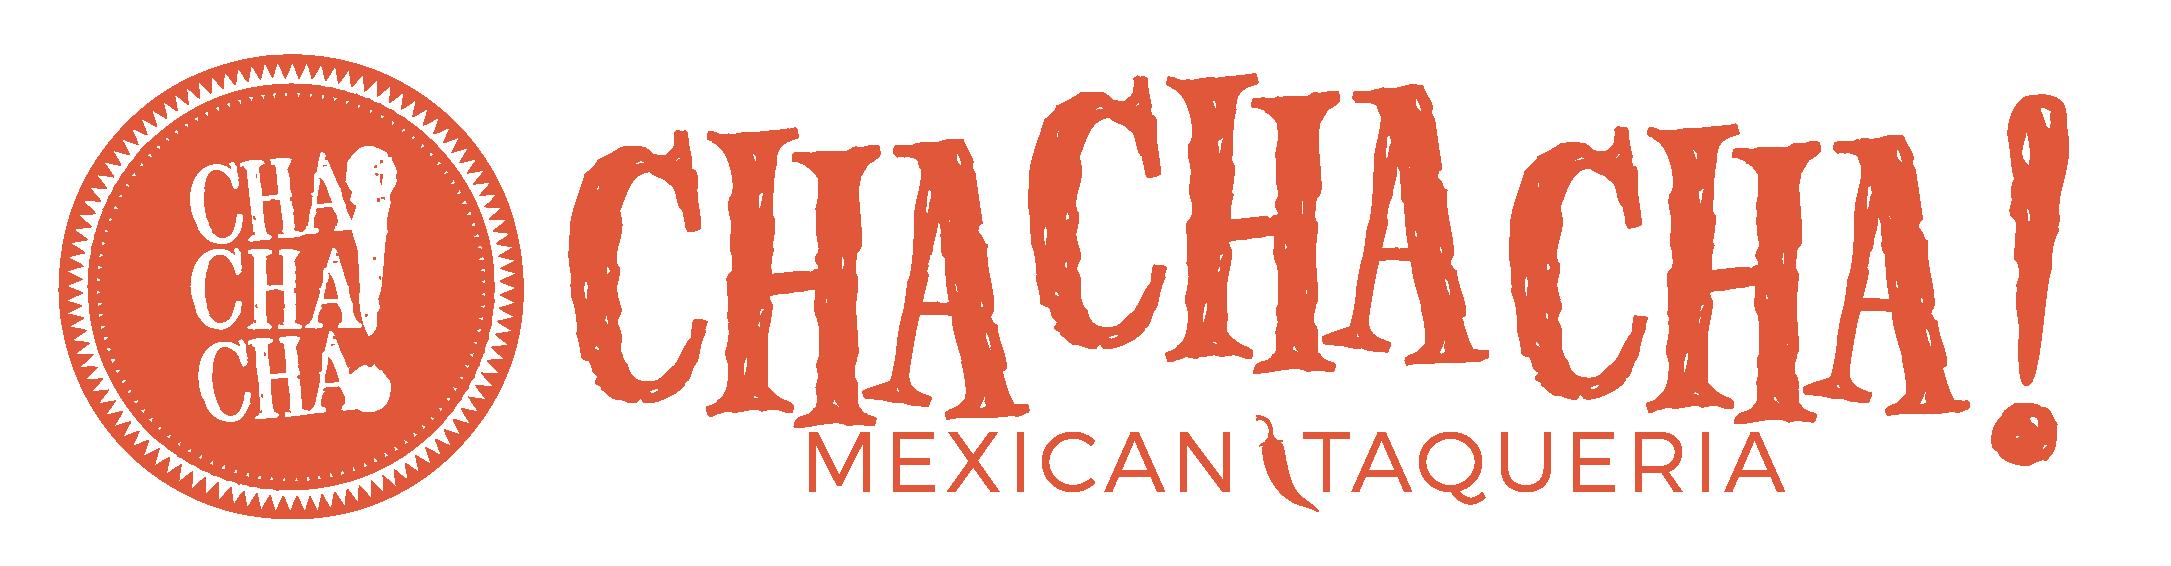 Cha Cha Cha  Taqueria & Bar